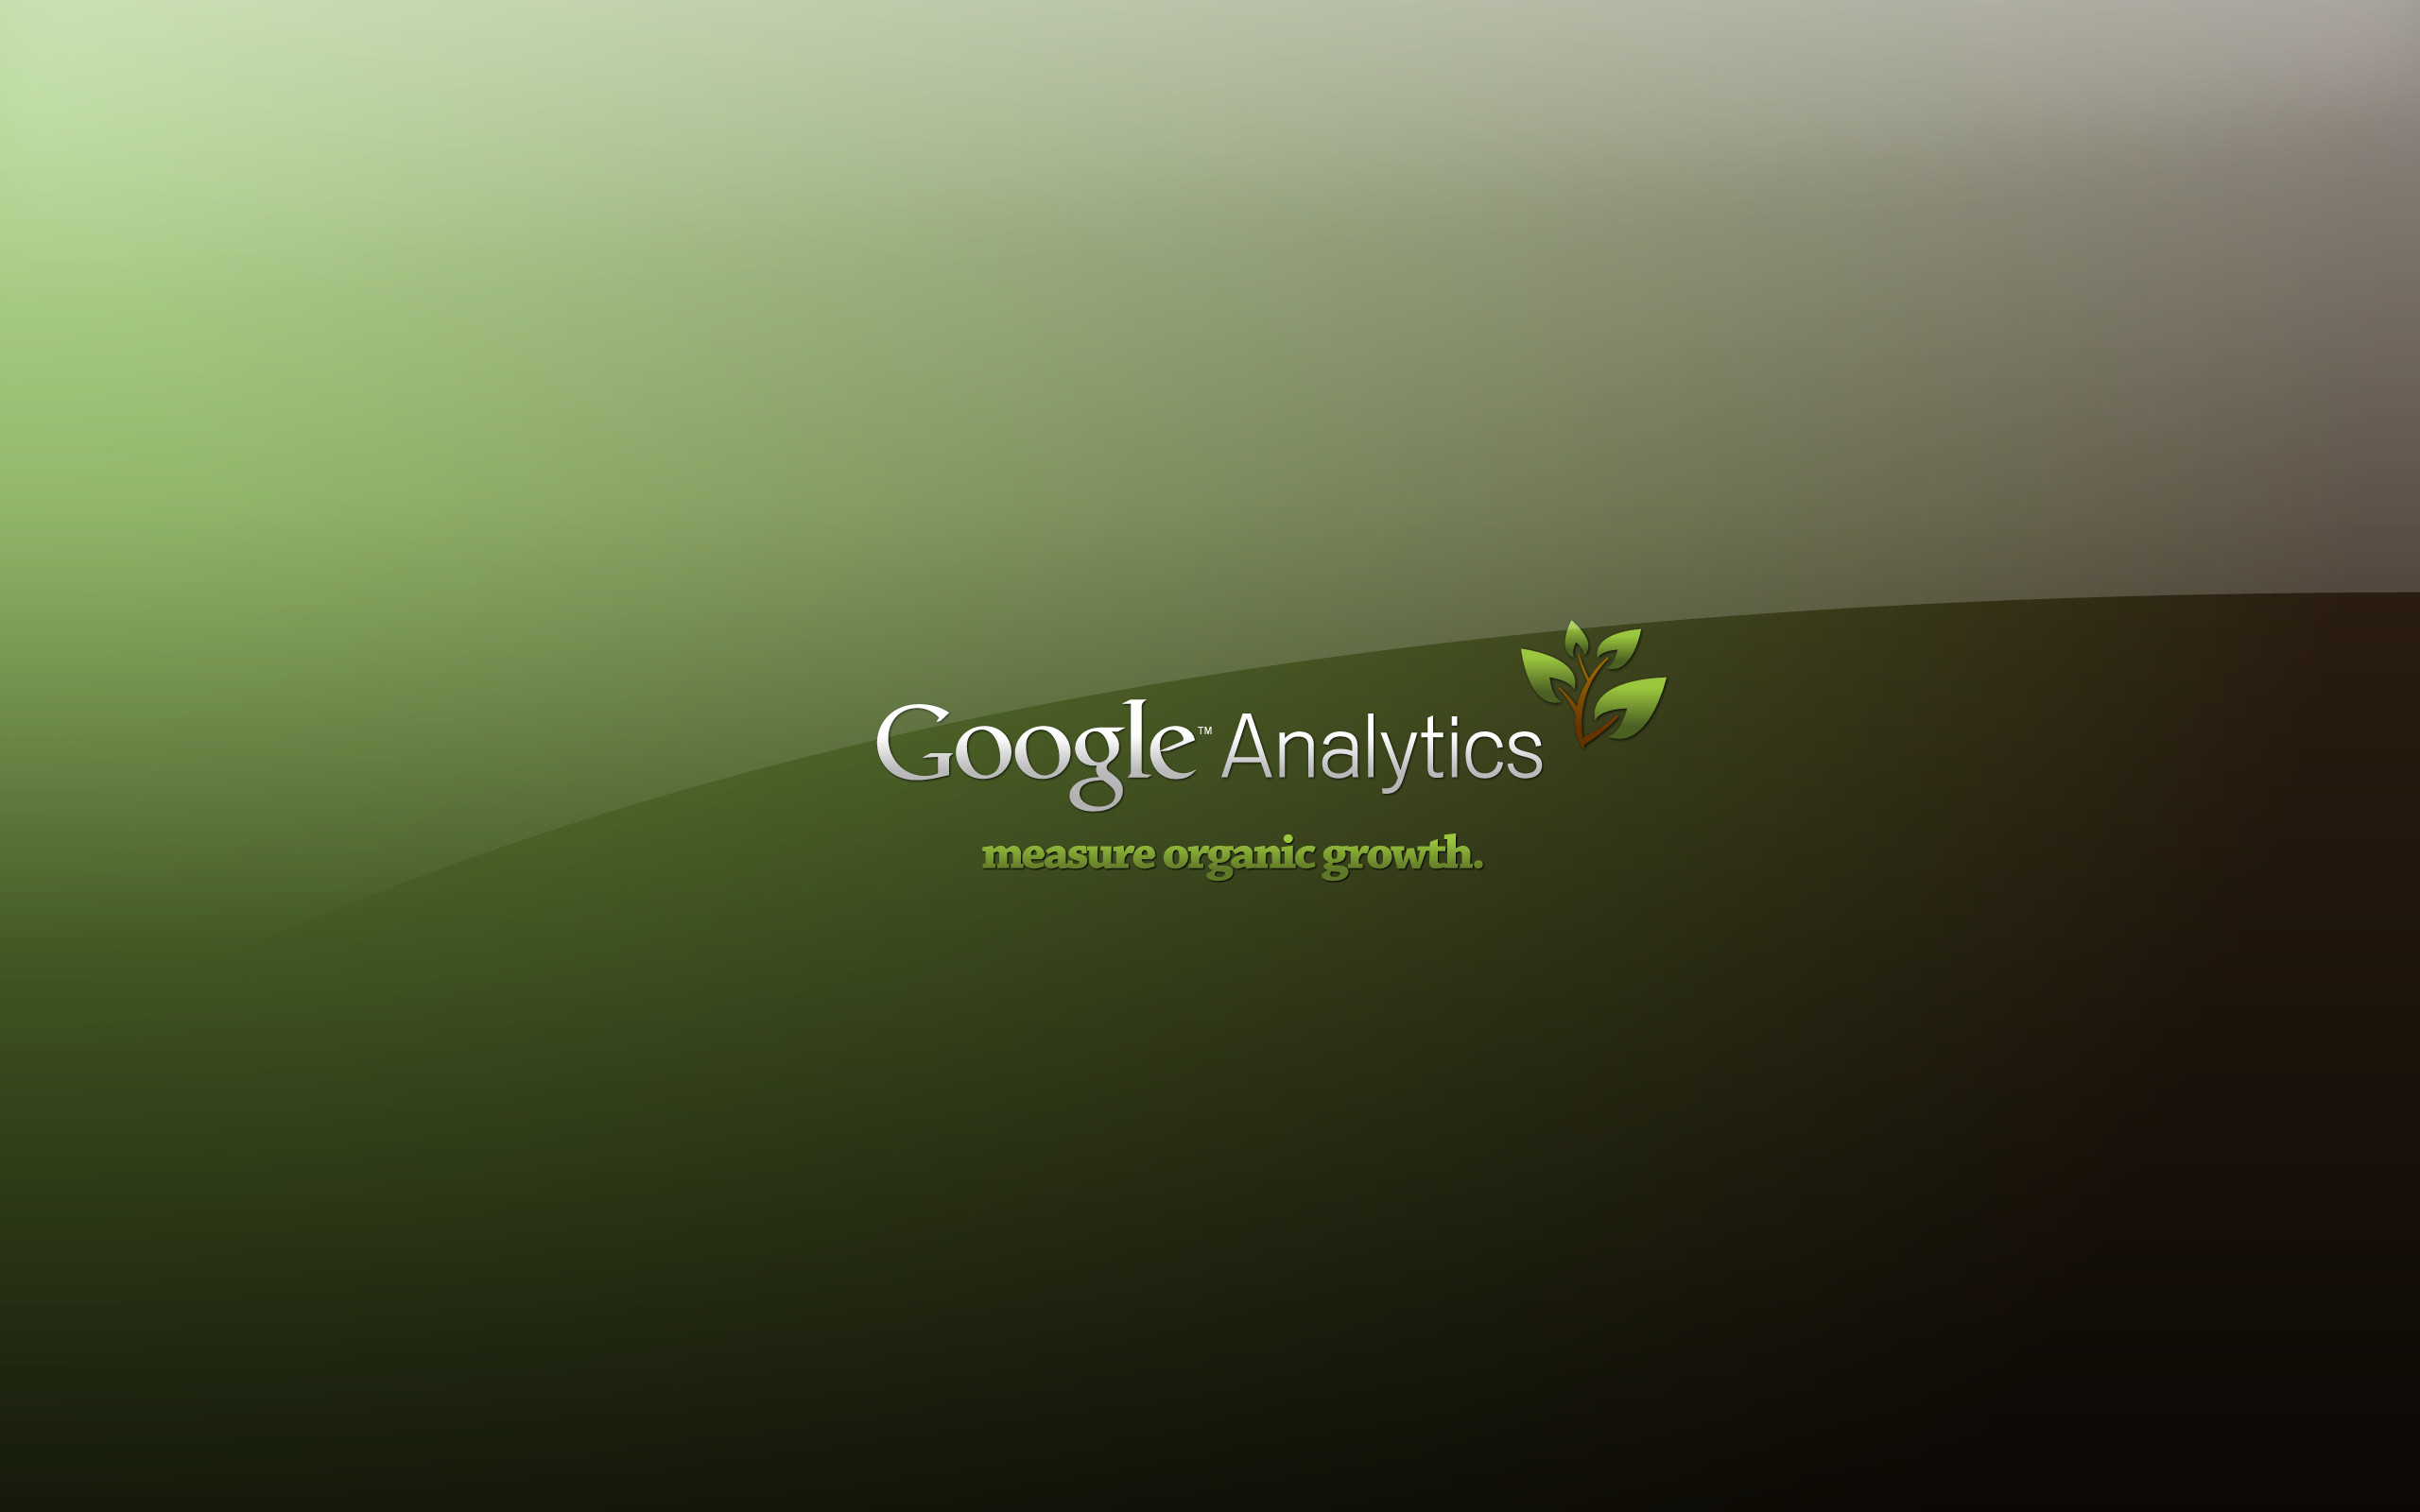 New google wallpaper 67 images 1920x1080 google wallpapers new google wallpapers for android amazing wallpapers voltagebd Gallery